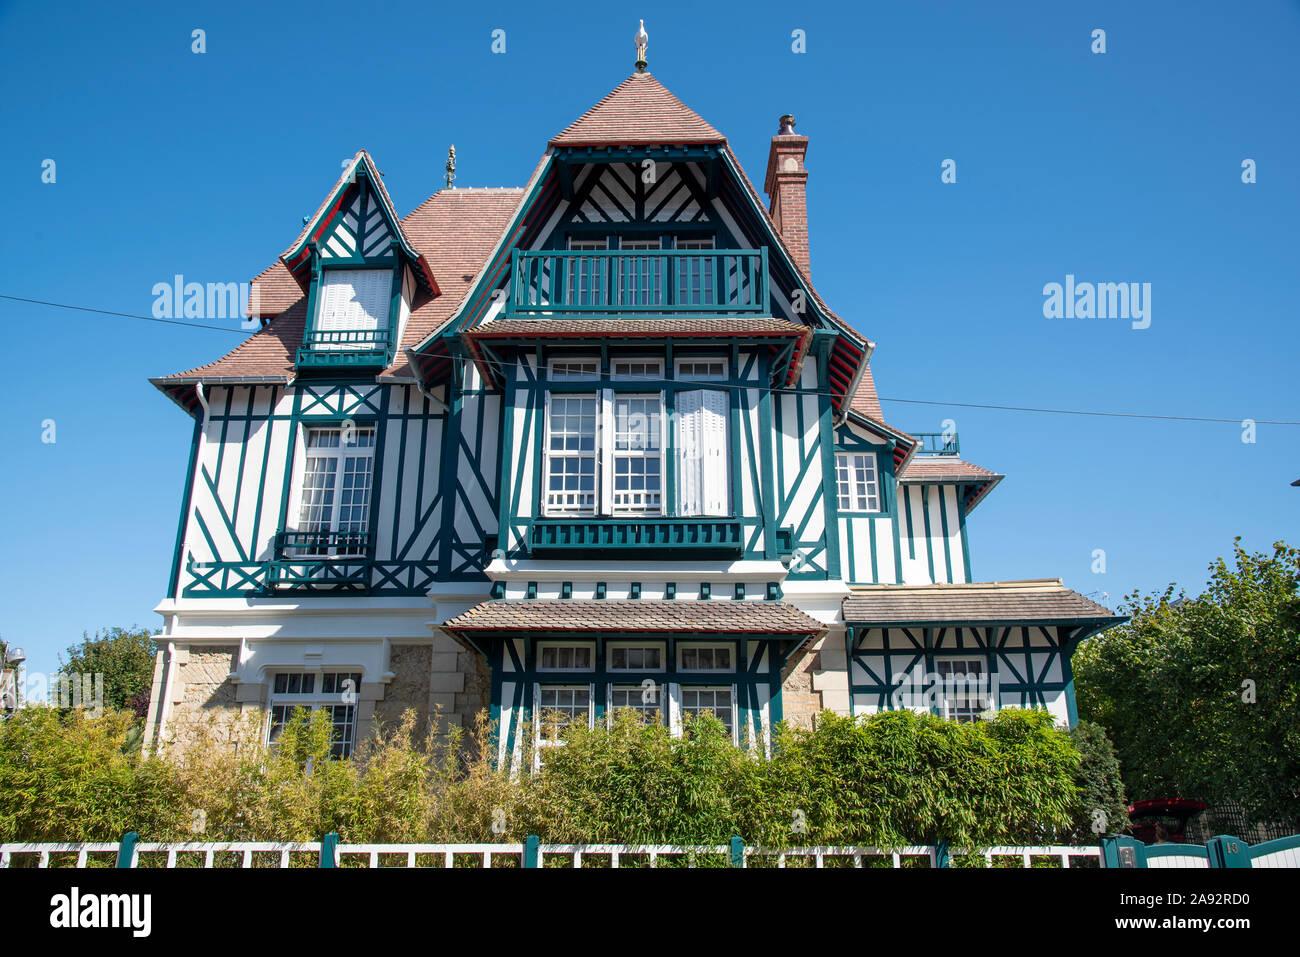 Traditionelle Architektur In Trouville Sur Mer Normandie Frankreich Stock Photo Alamy